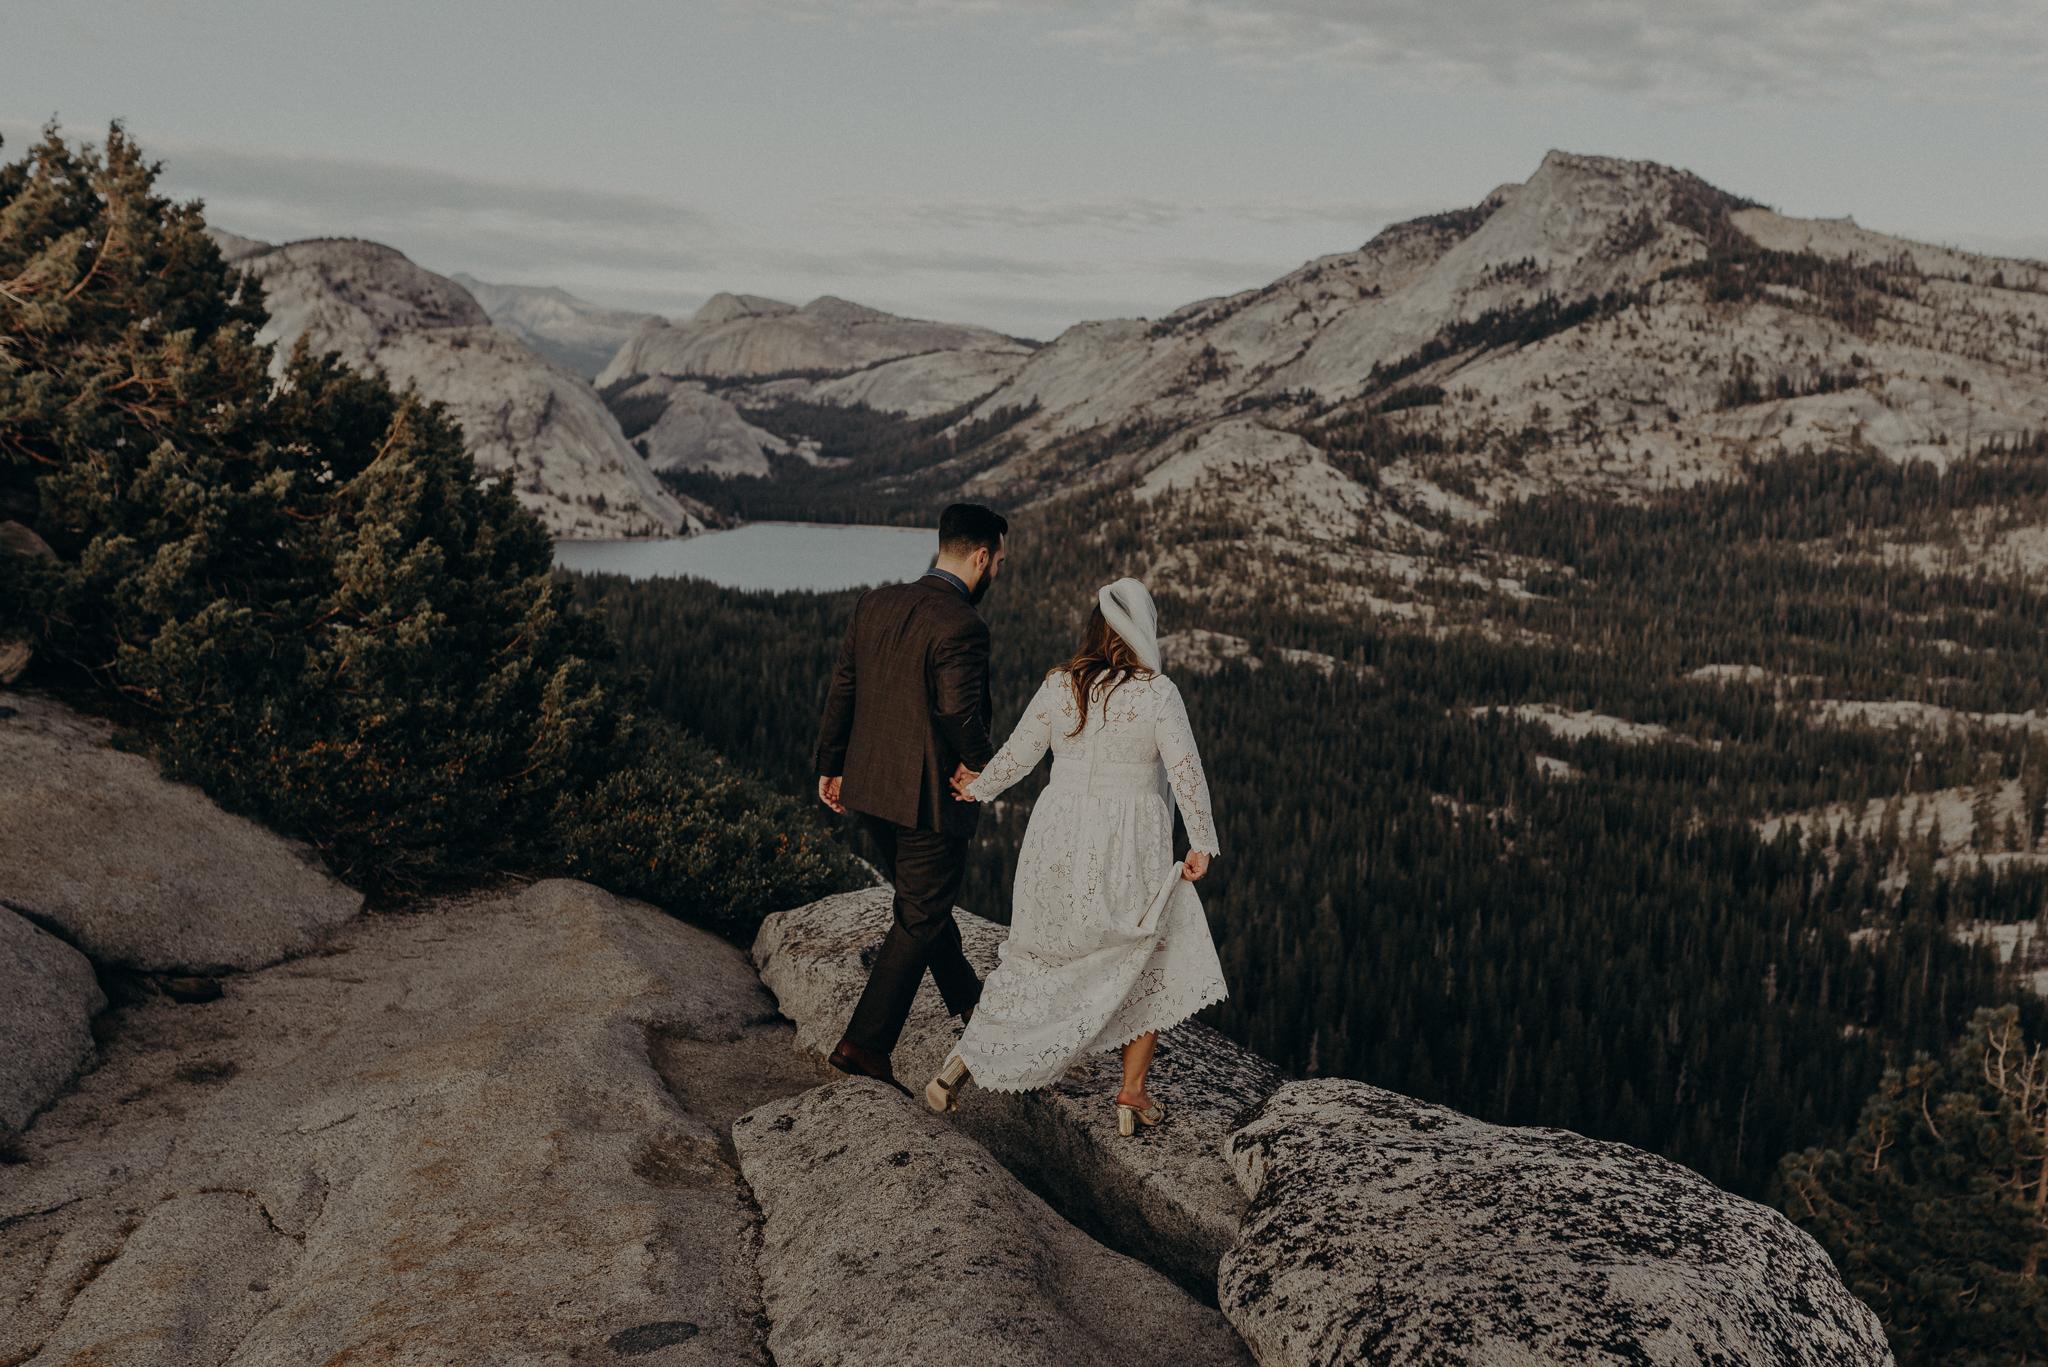 Yosemite Elopement Photographer - Evergreen Lodge Wedding Photographer - IsaiahAndTaylor.com-019.jpg